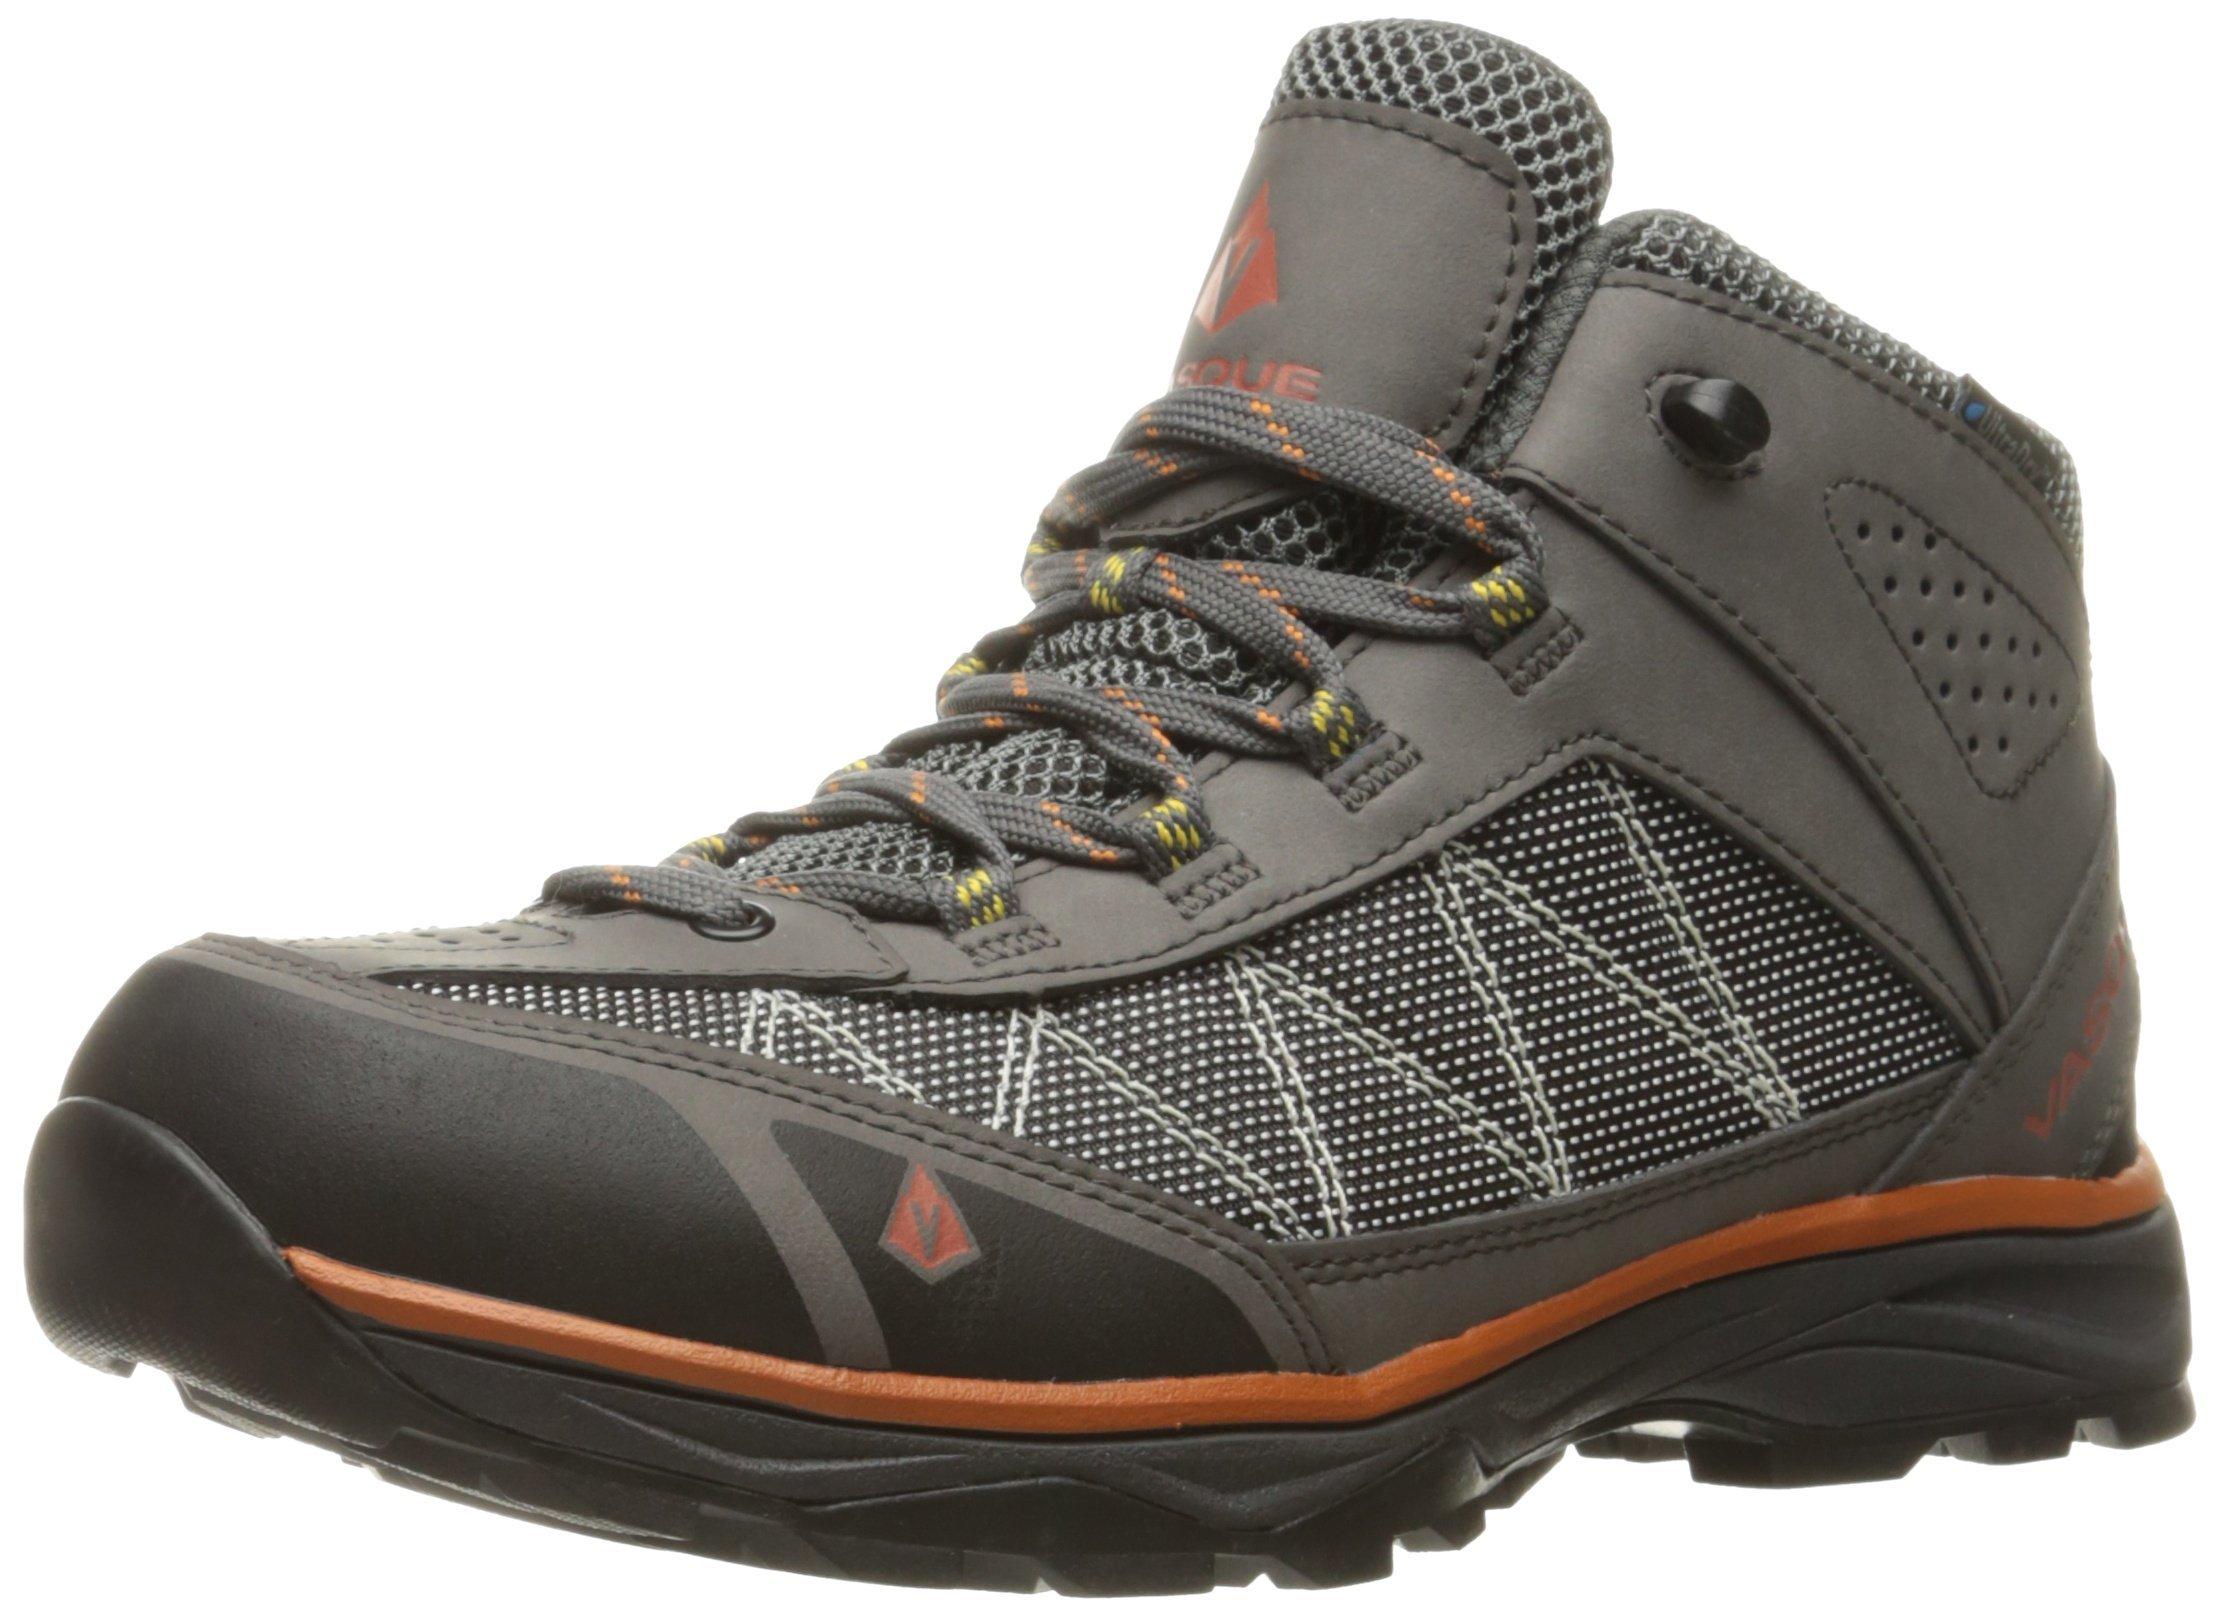 Vasque Men's Monolith Hiking Boot, Magnet/White, 9 M US